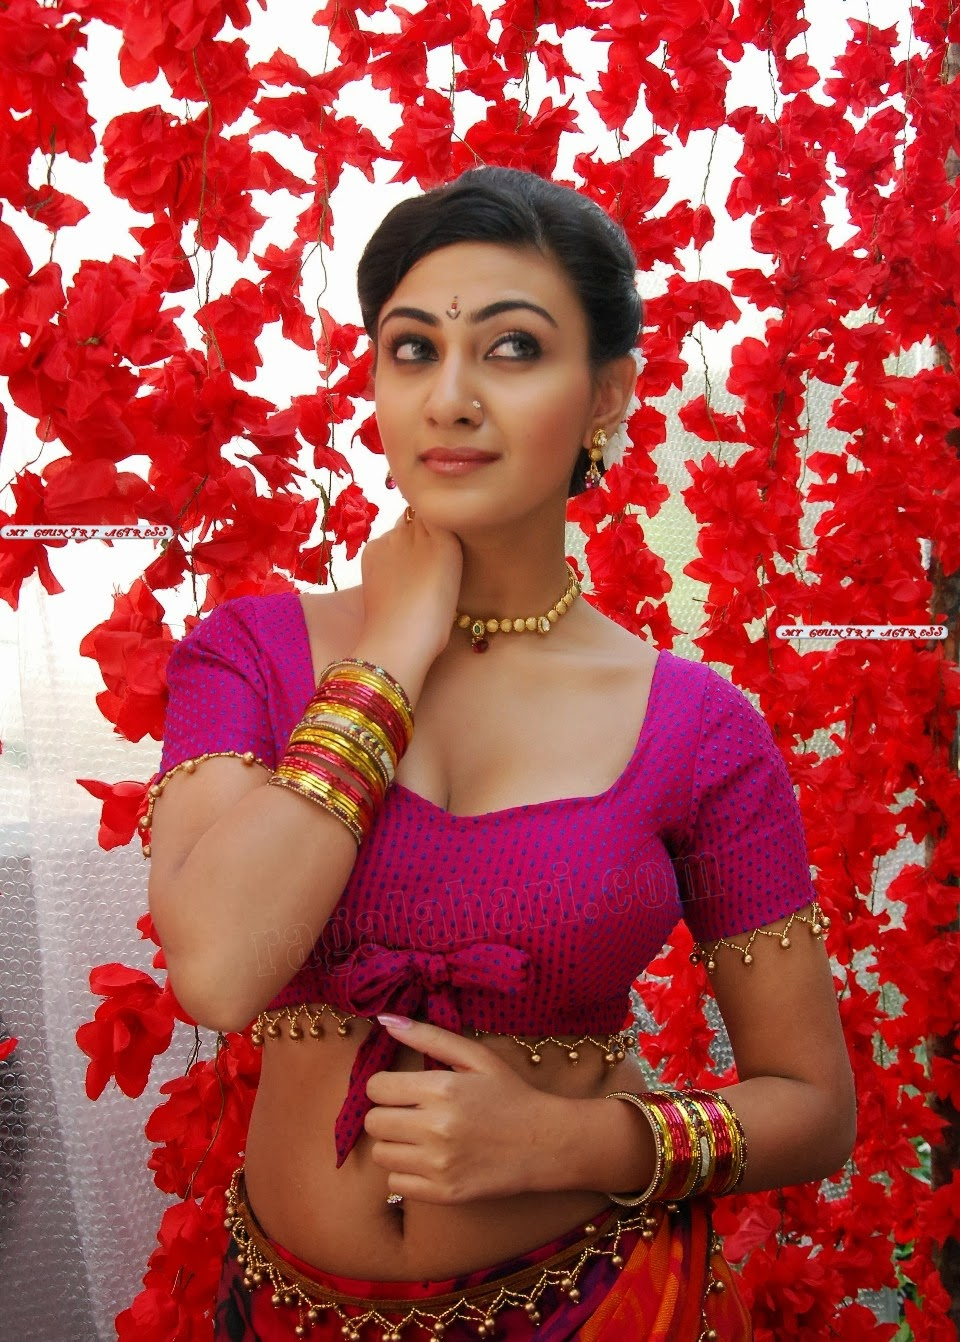 07 Hot Indian Actress Neelam Upadhyay Kannada Photo